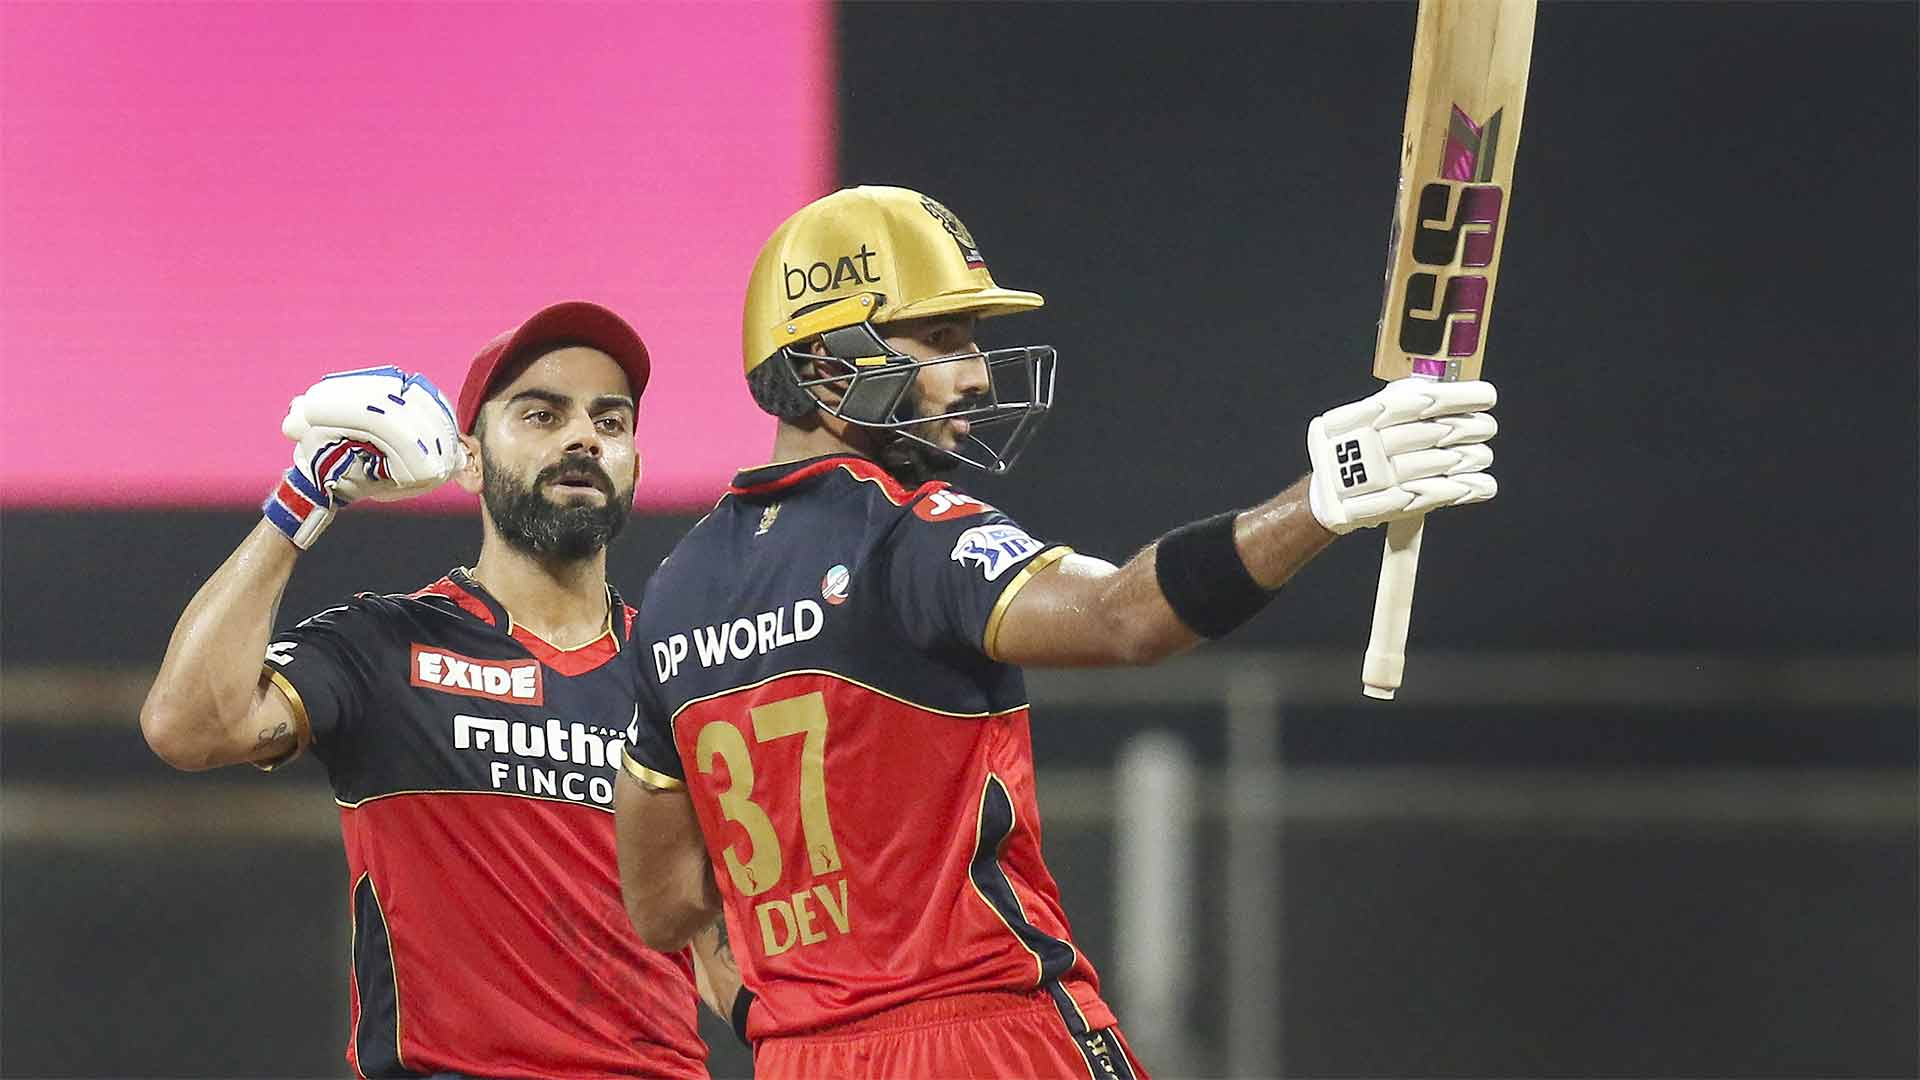 In Pics: How Devdutt Paddikal and Virat Kohli blew away Rajasthan Royals